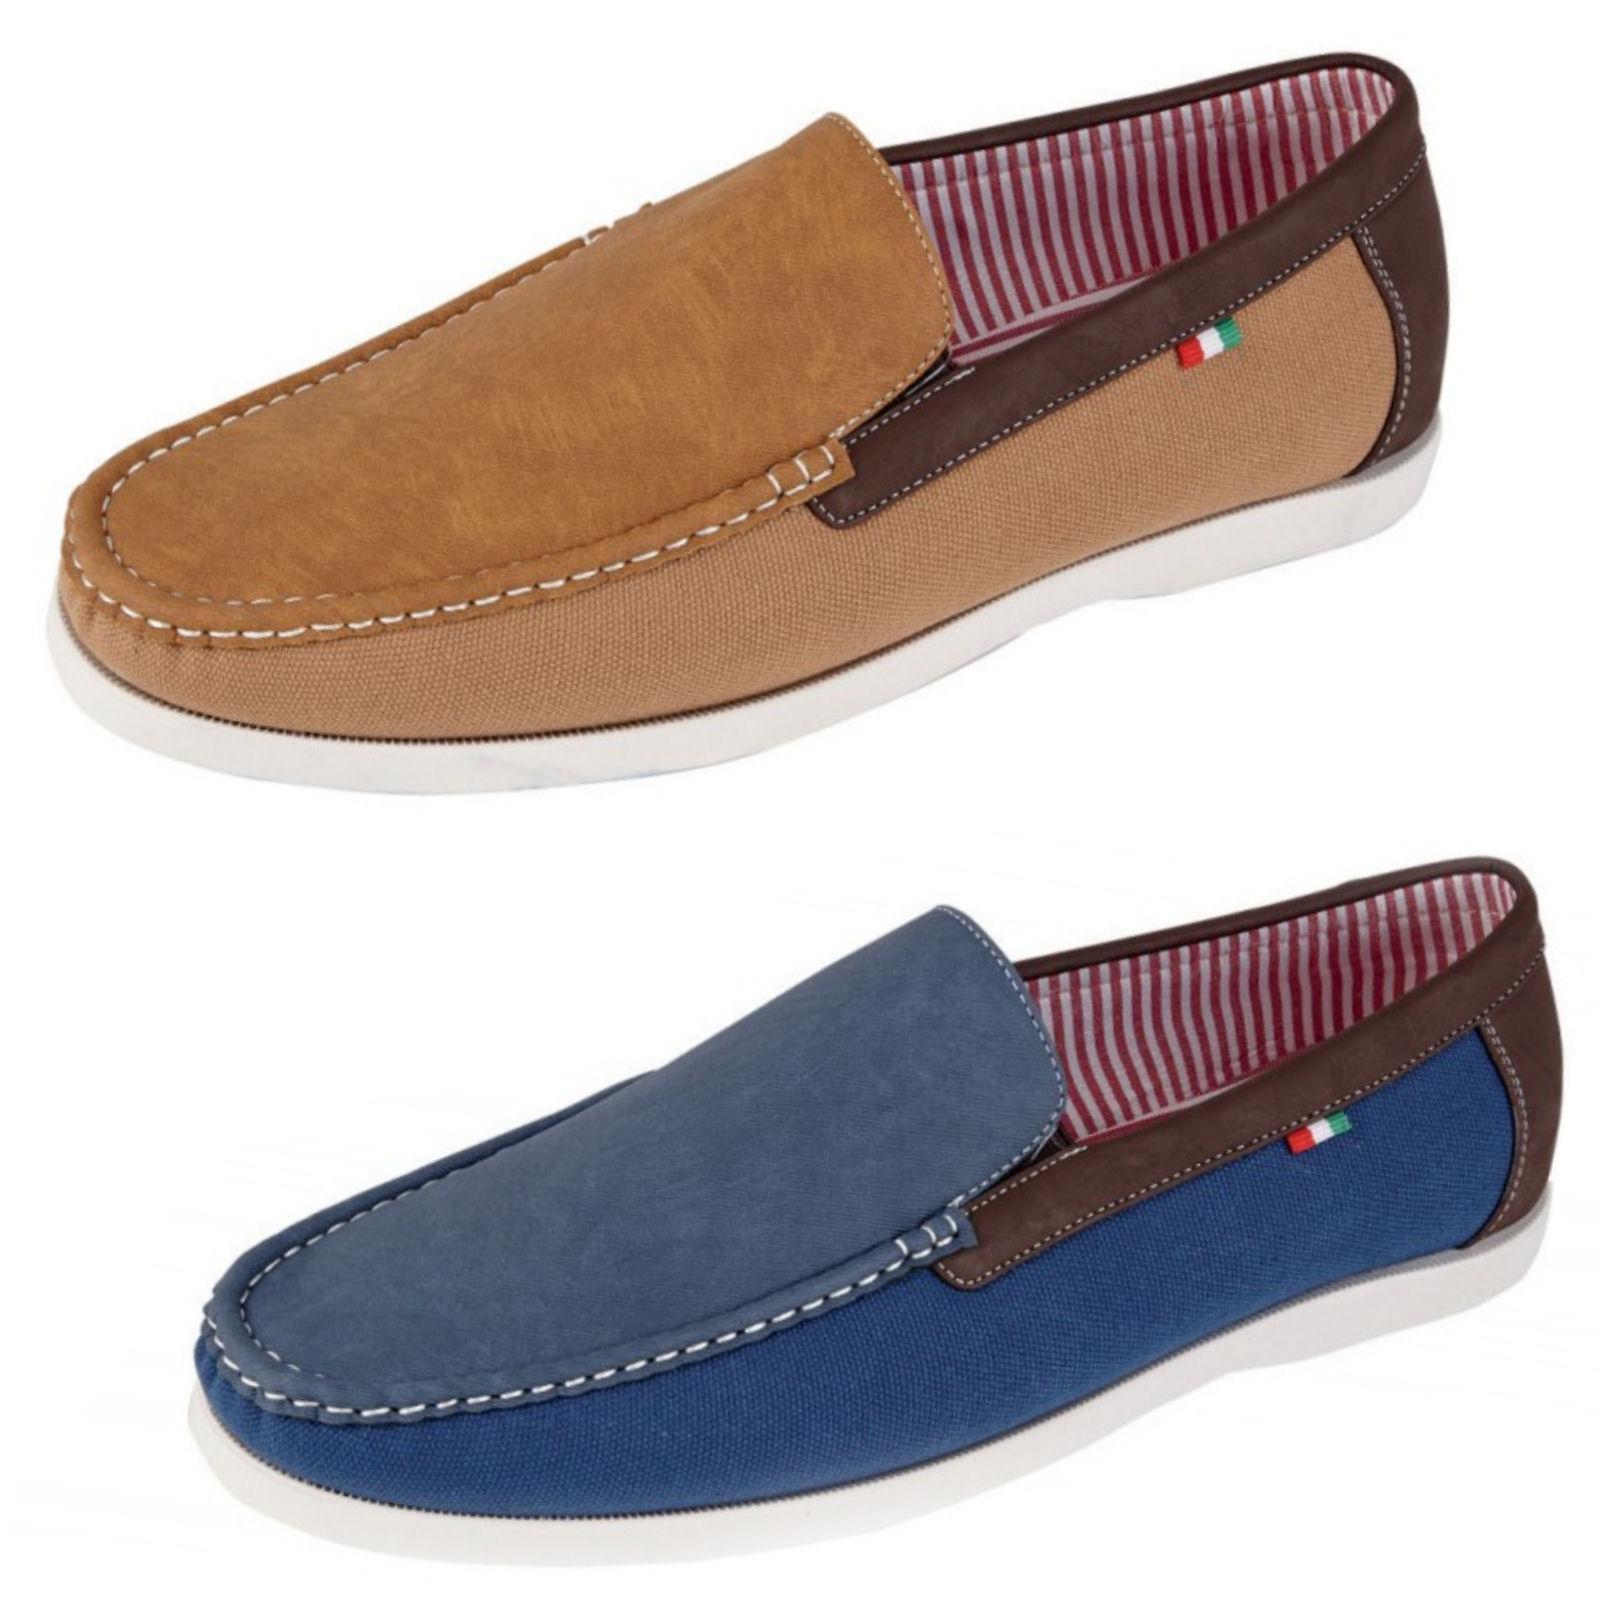 duke d555 claude mens slip on shoes king size boat